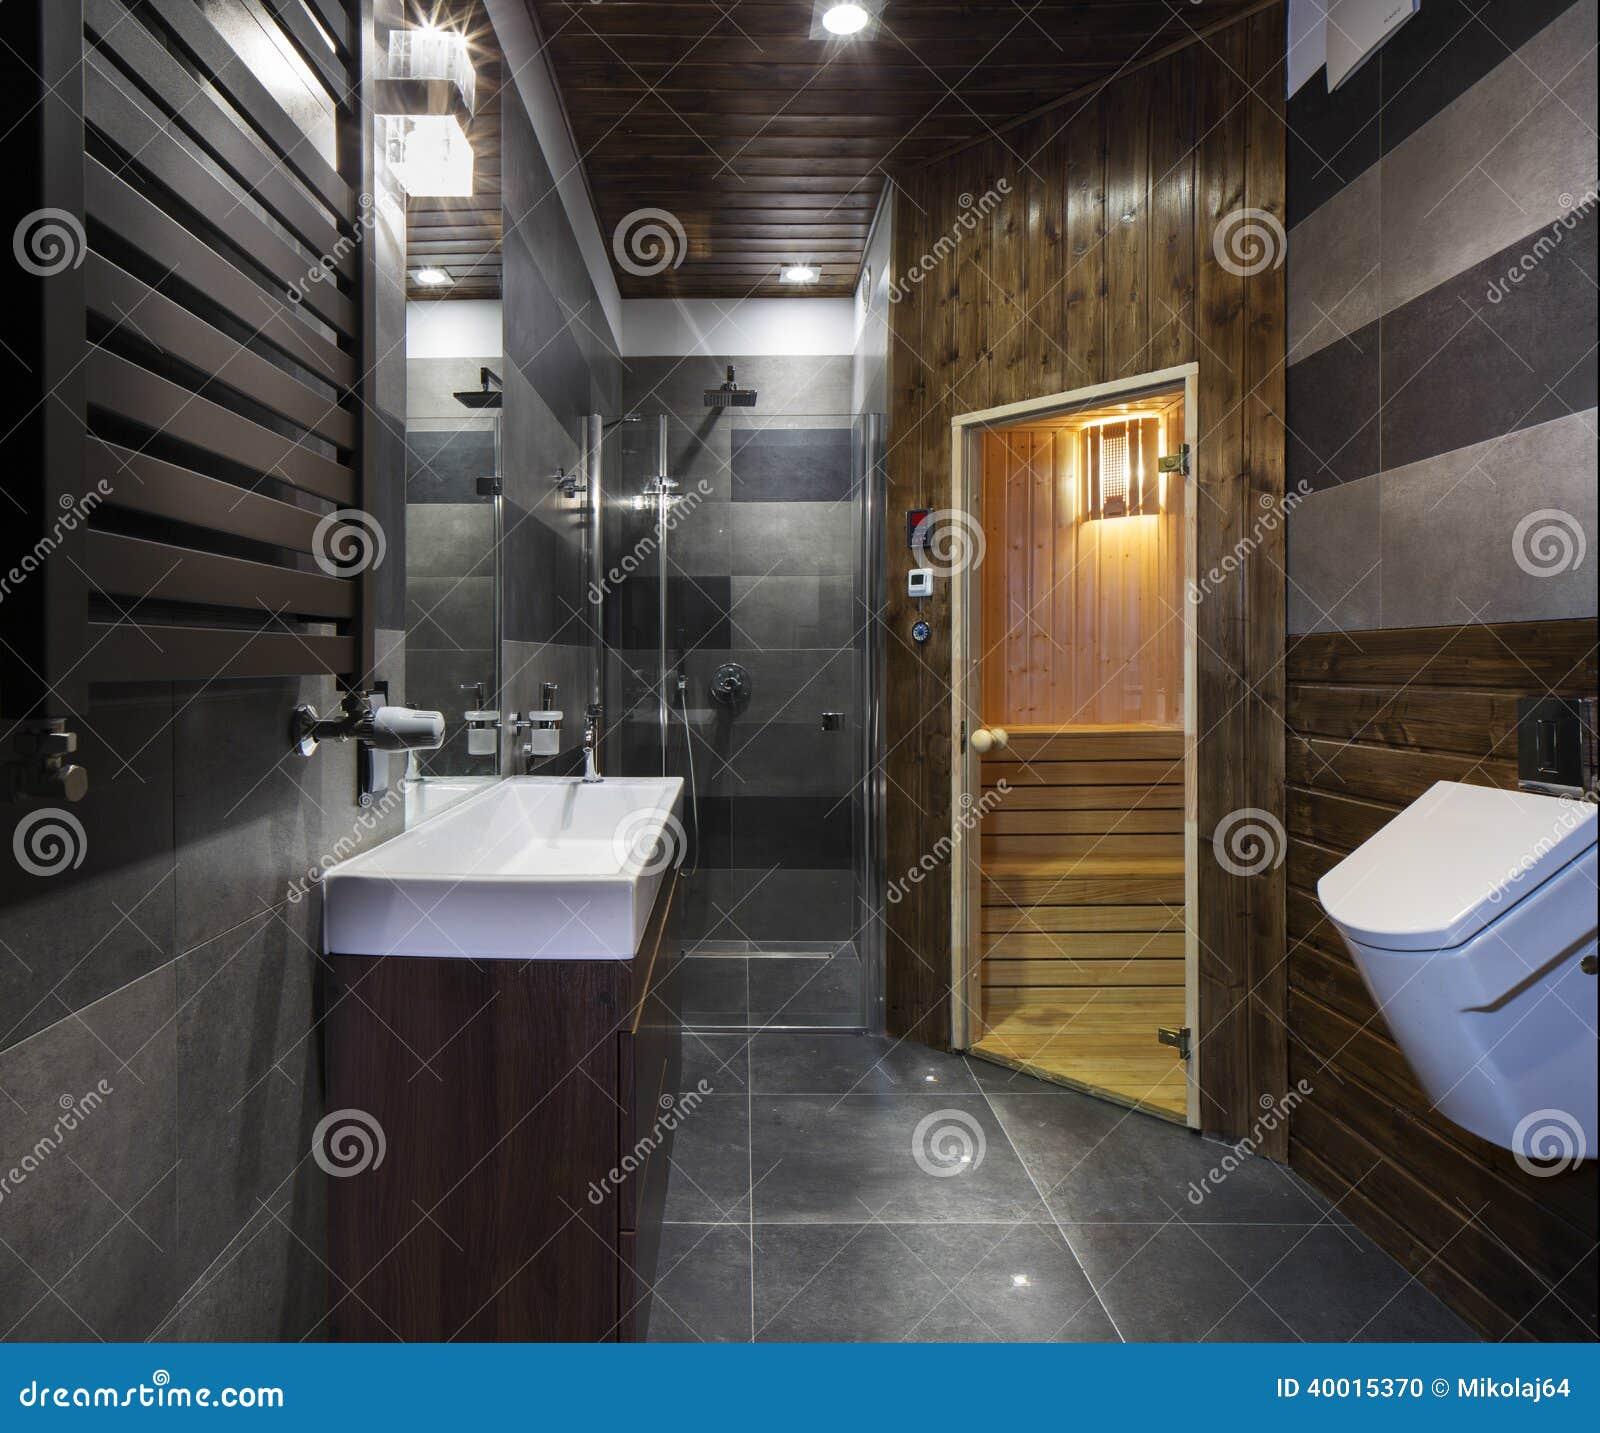 Contemporary bathroom philadelphia by abruzzi stone amp flooring - Contemporary Bathroom Philadelphia By Abruzzi Stone Amp Flooring Bathroom With Sauna Stock Photo Image 40015370